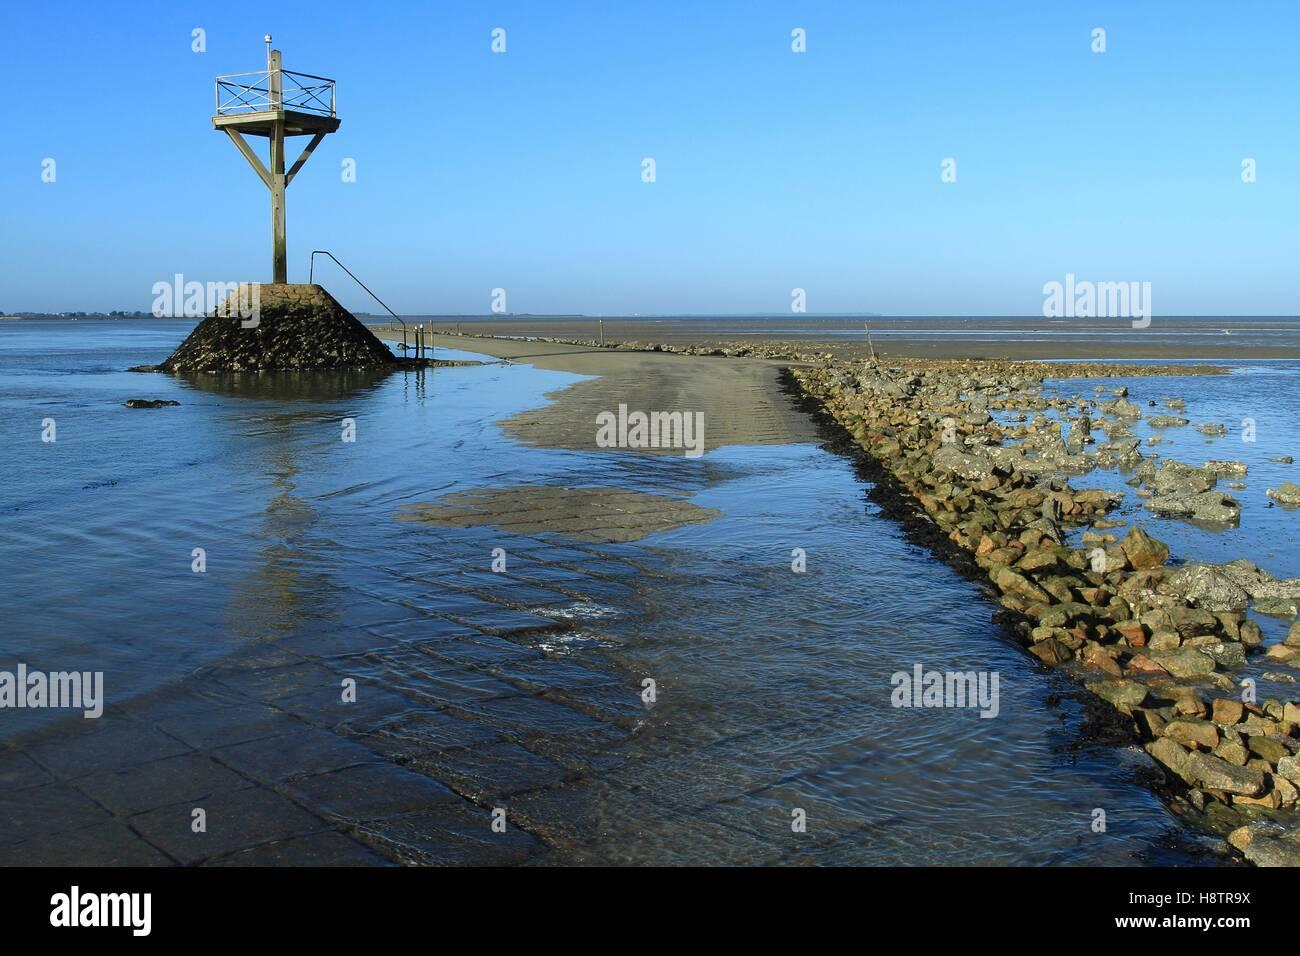 Passage du Gois - submersible causeway linking the mainland to the island of Noirmoutier , Vendée, France Stock Photo